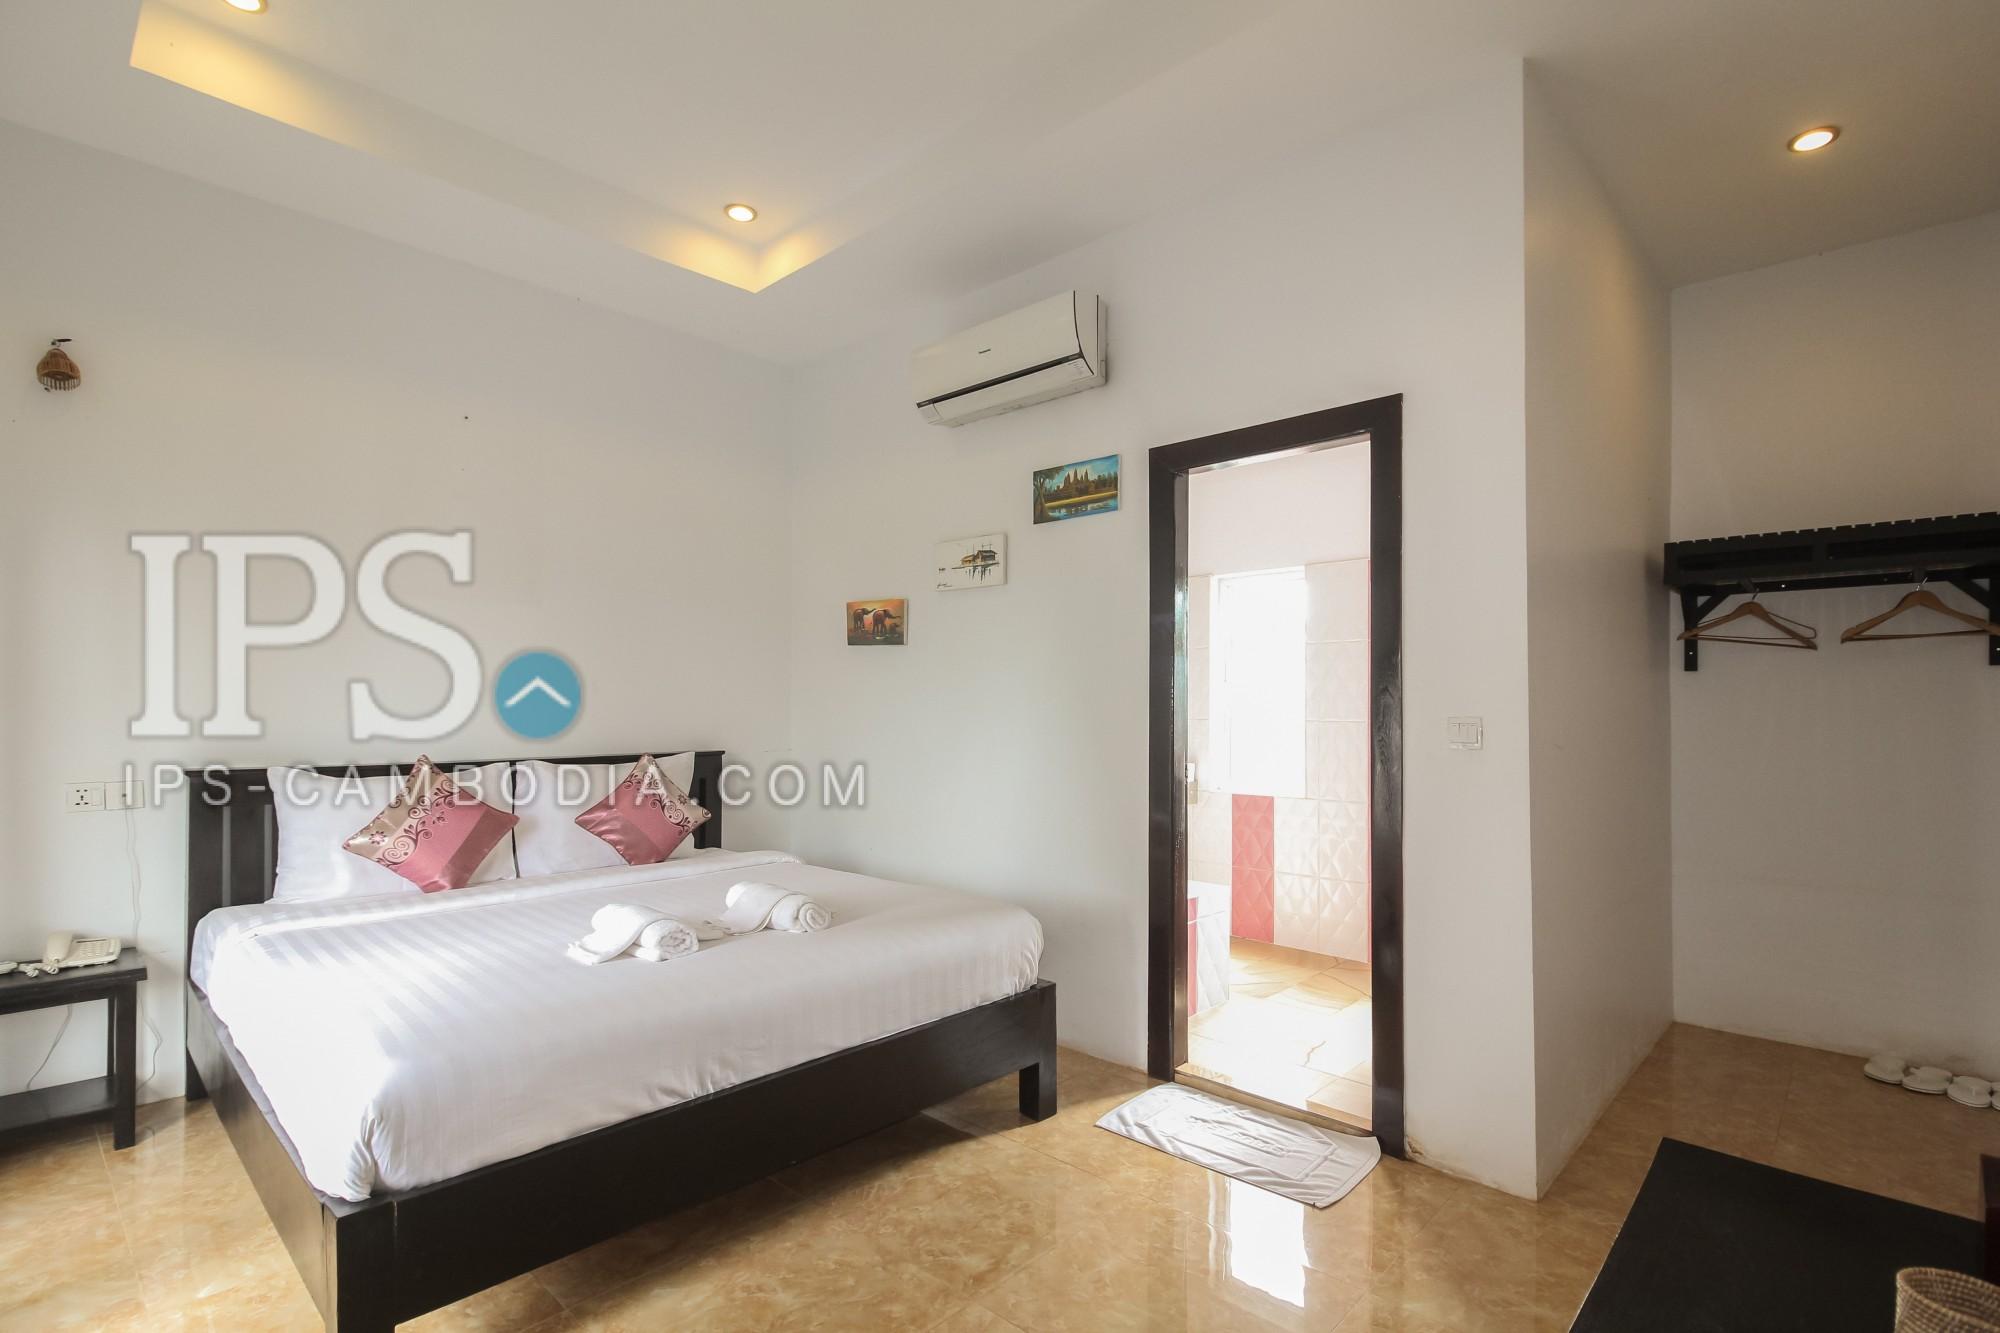 11 Bedroom Boutique Hotel for Rent in Svay Dangkum, Siem Reap